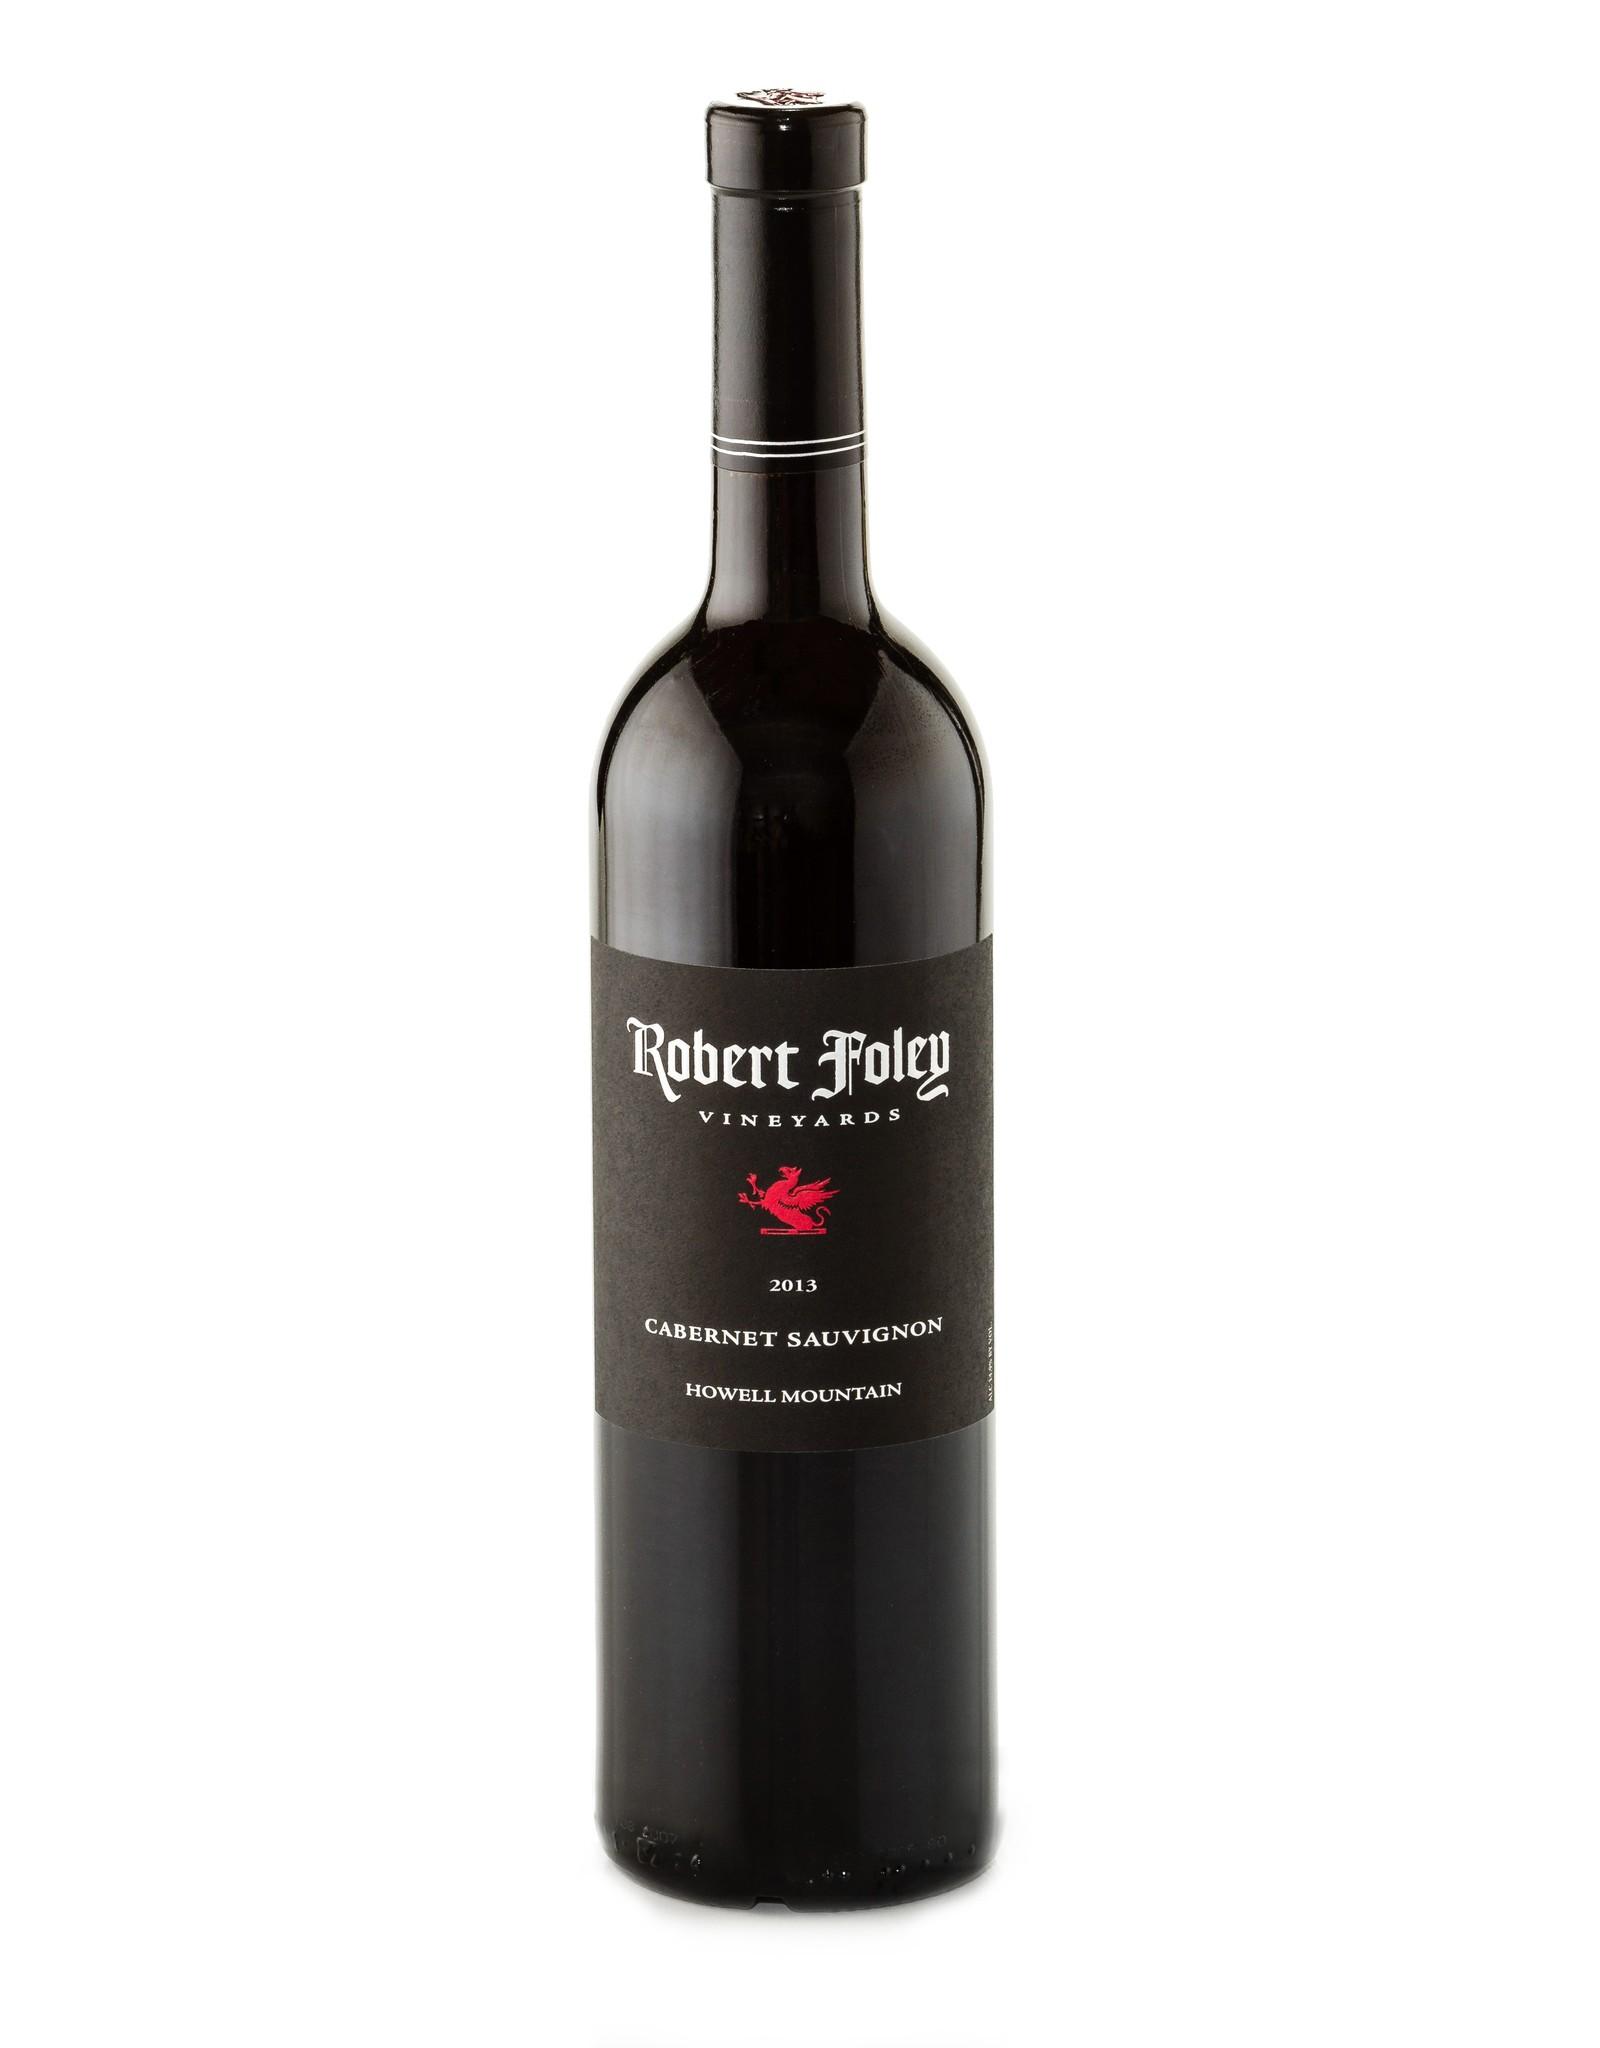 Robert Foley Vineyards Cabernet Sauvignon, Howell Mountain 2013